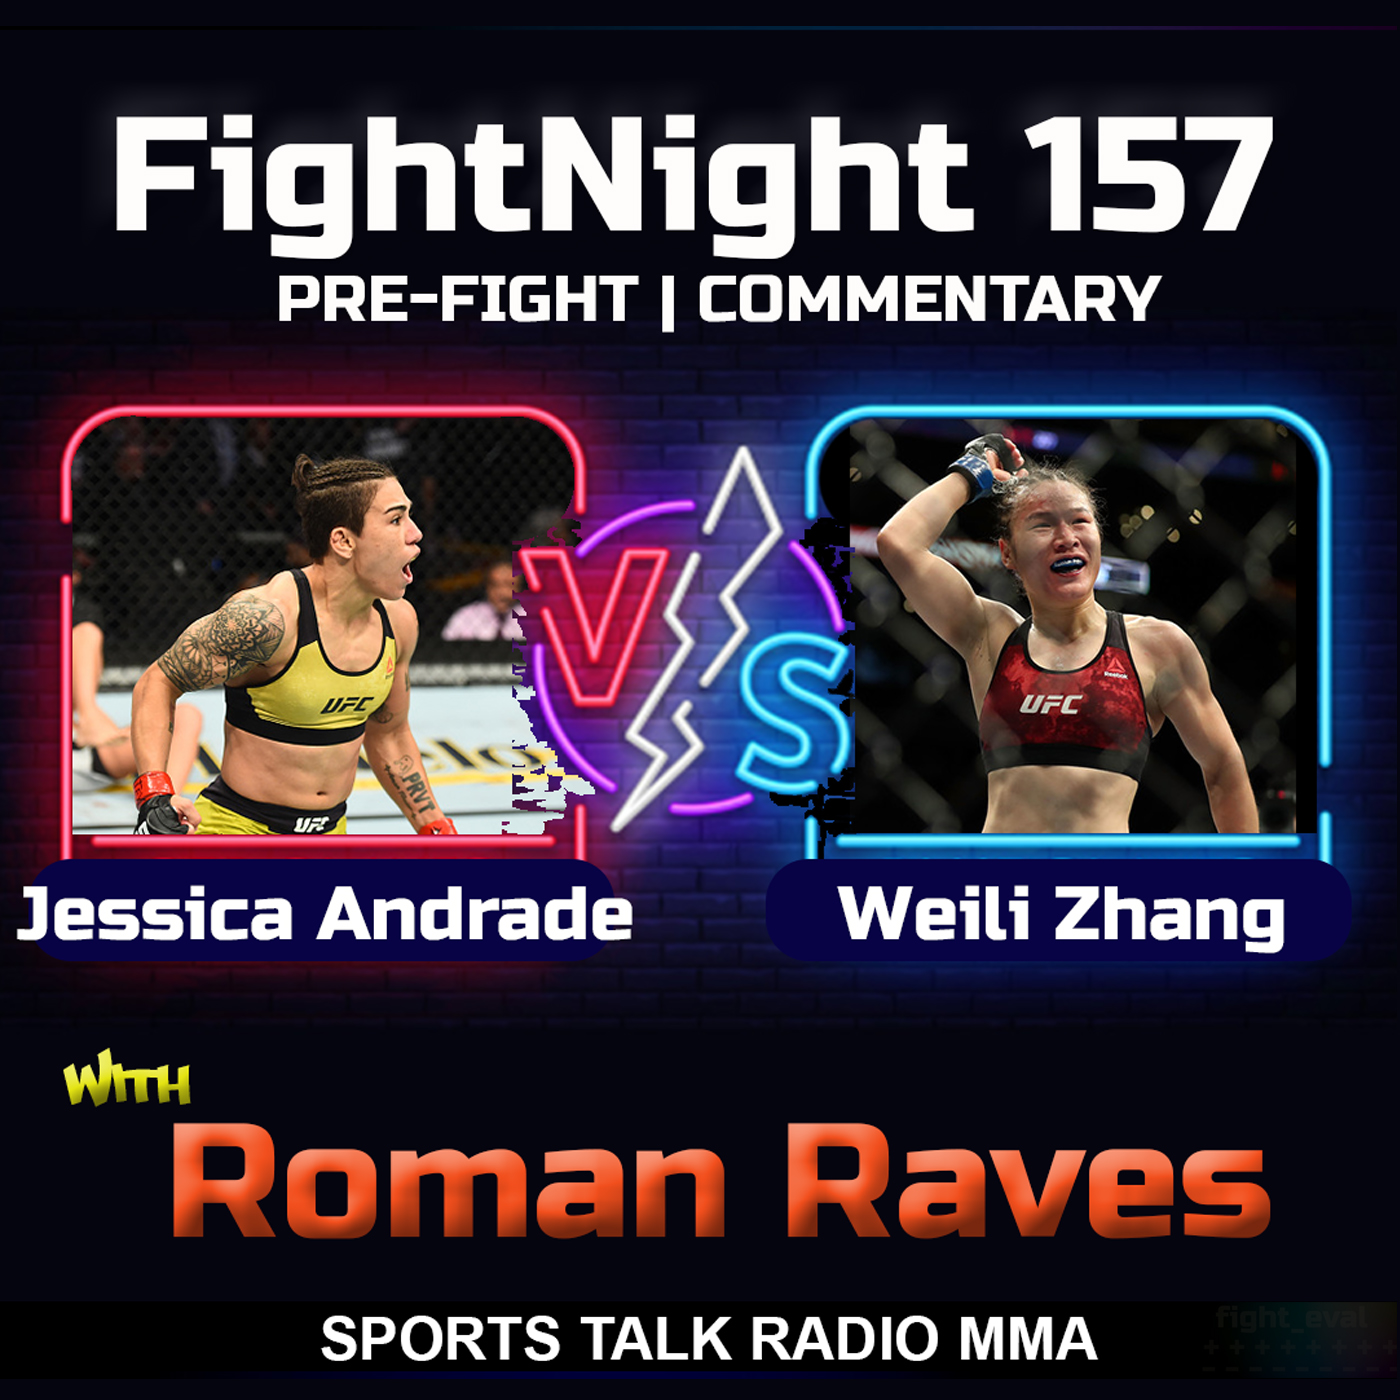 Artwork for Jessica Andrade vs Zhang Weili FightNight 157 Sports Talk Radio MMA